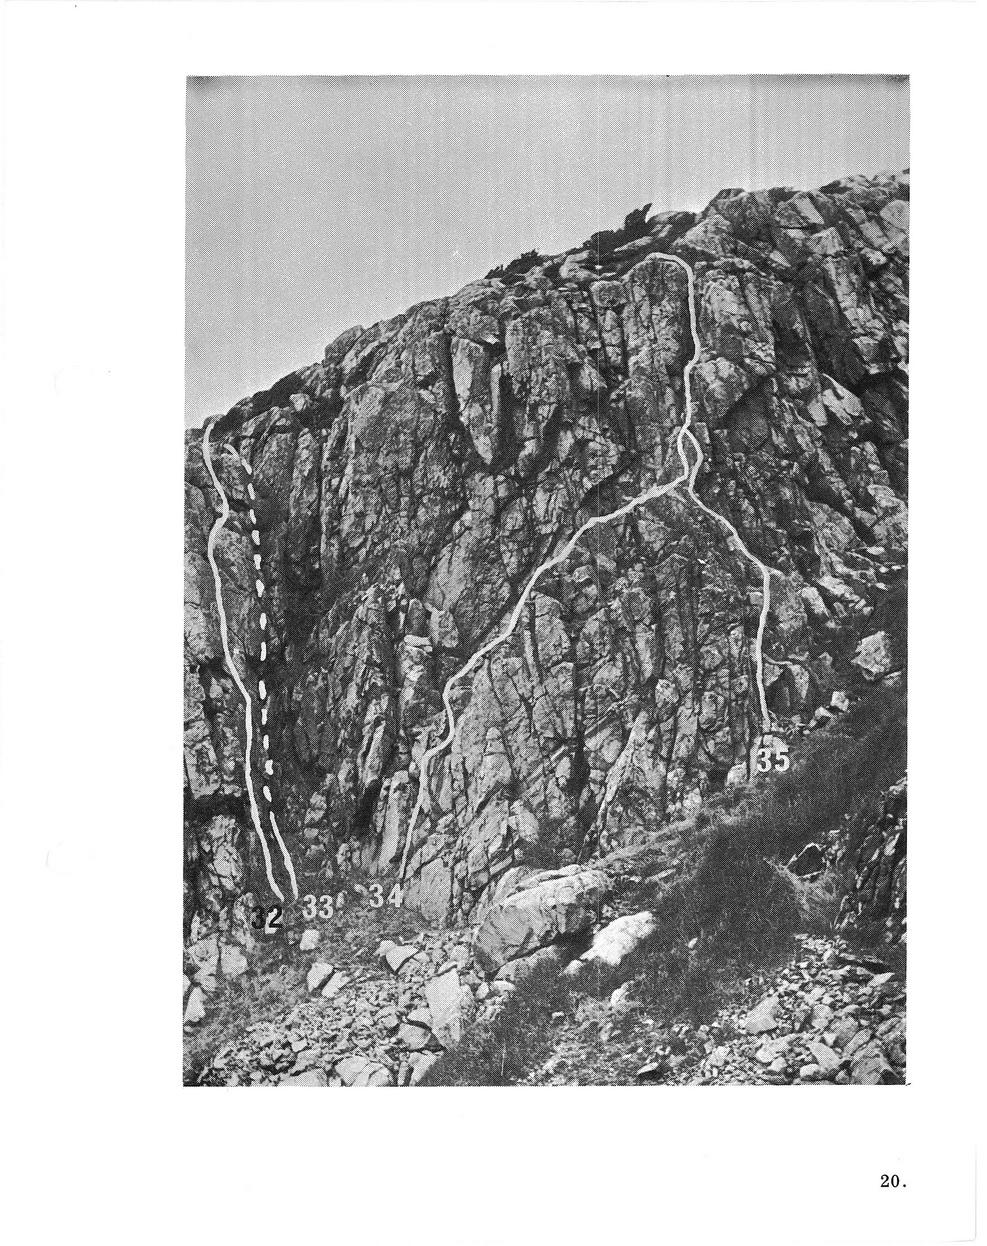 Kullen guide 1972 020.jpg